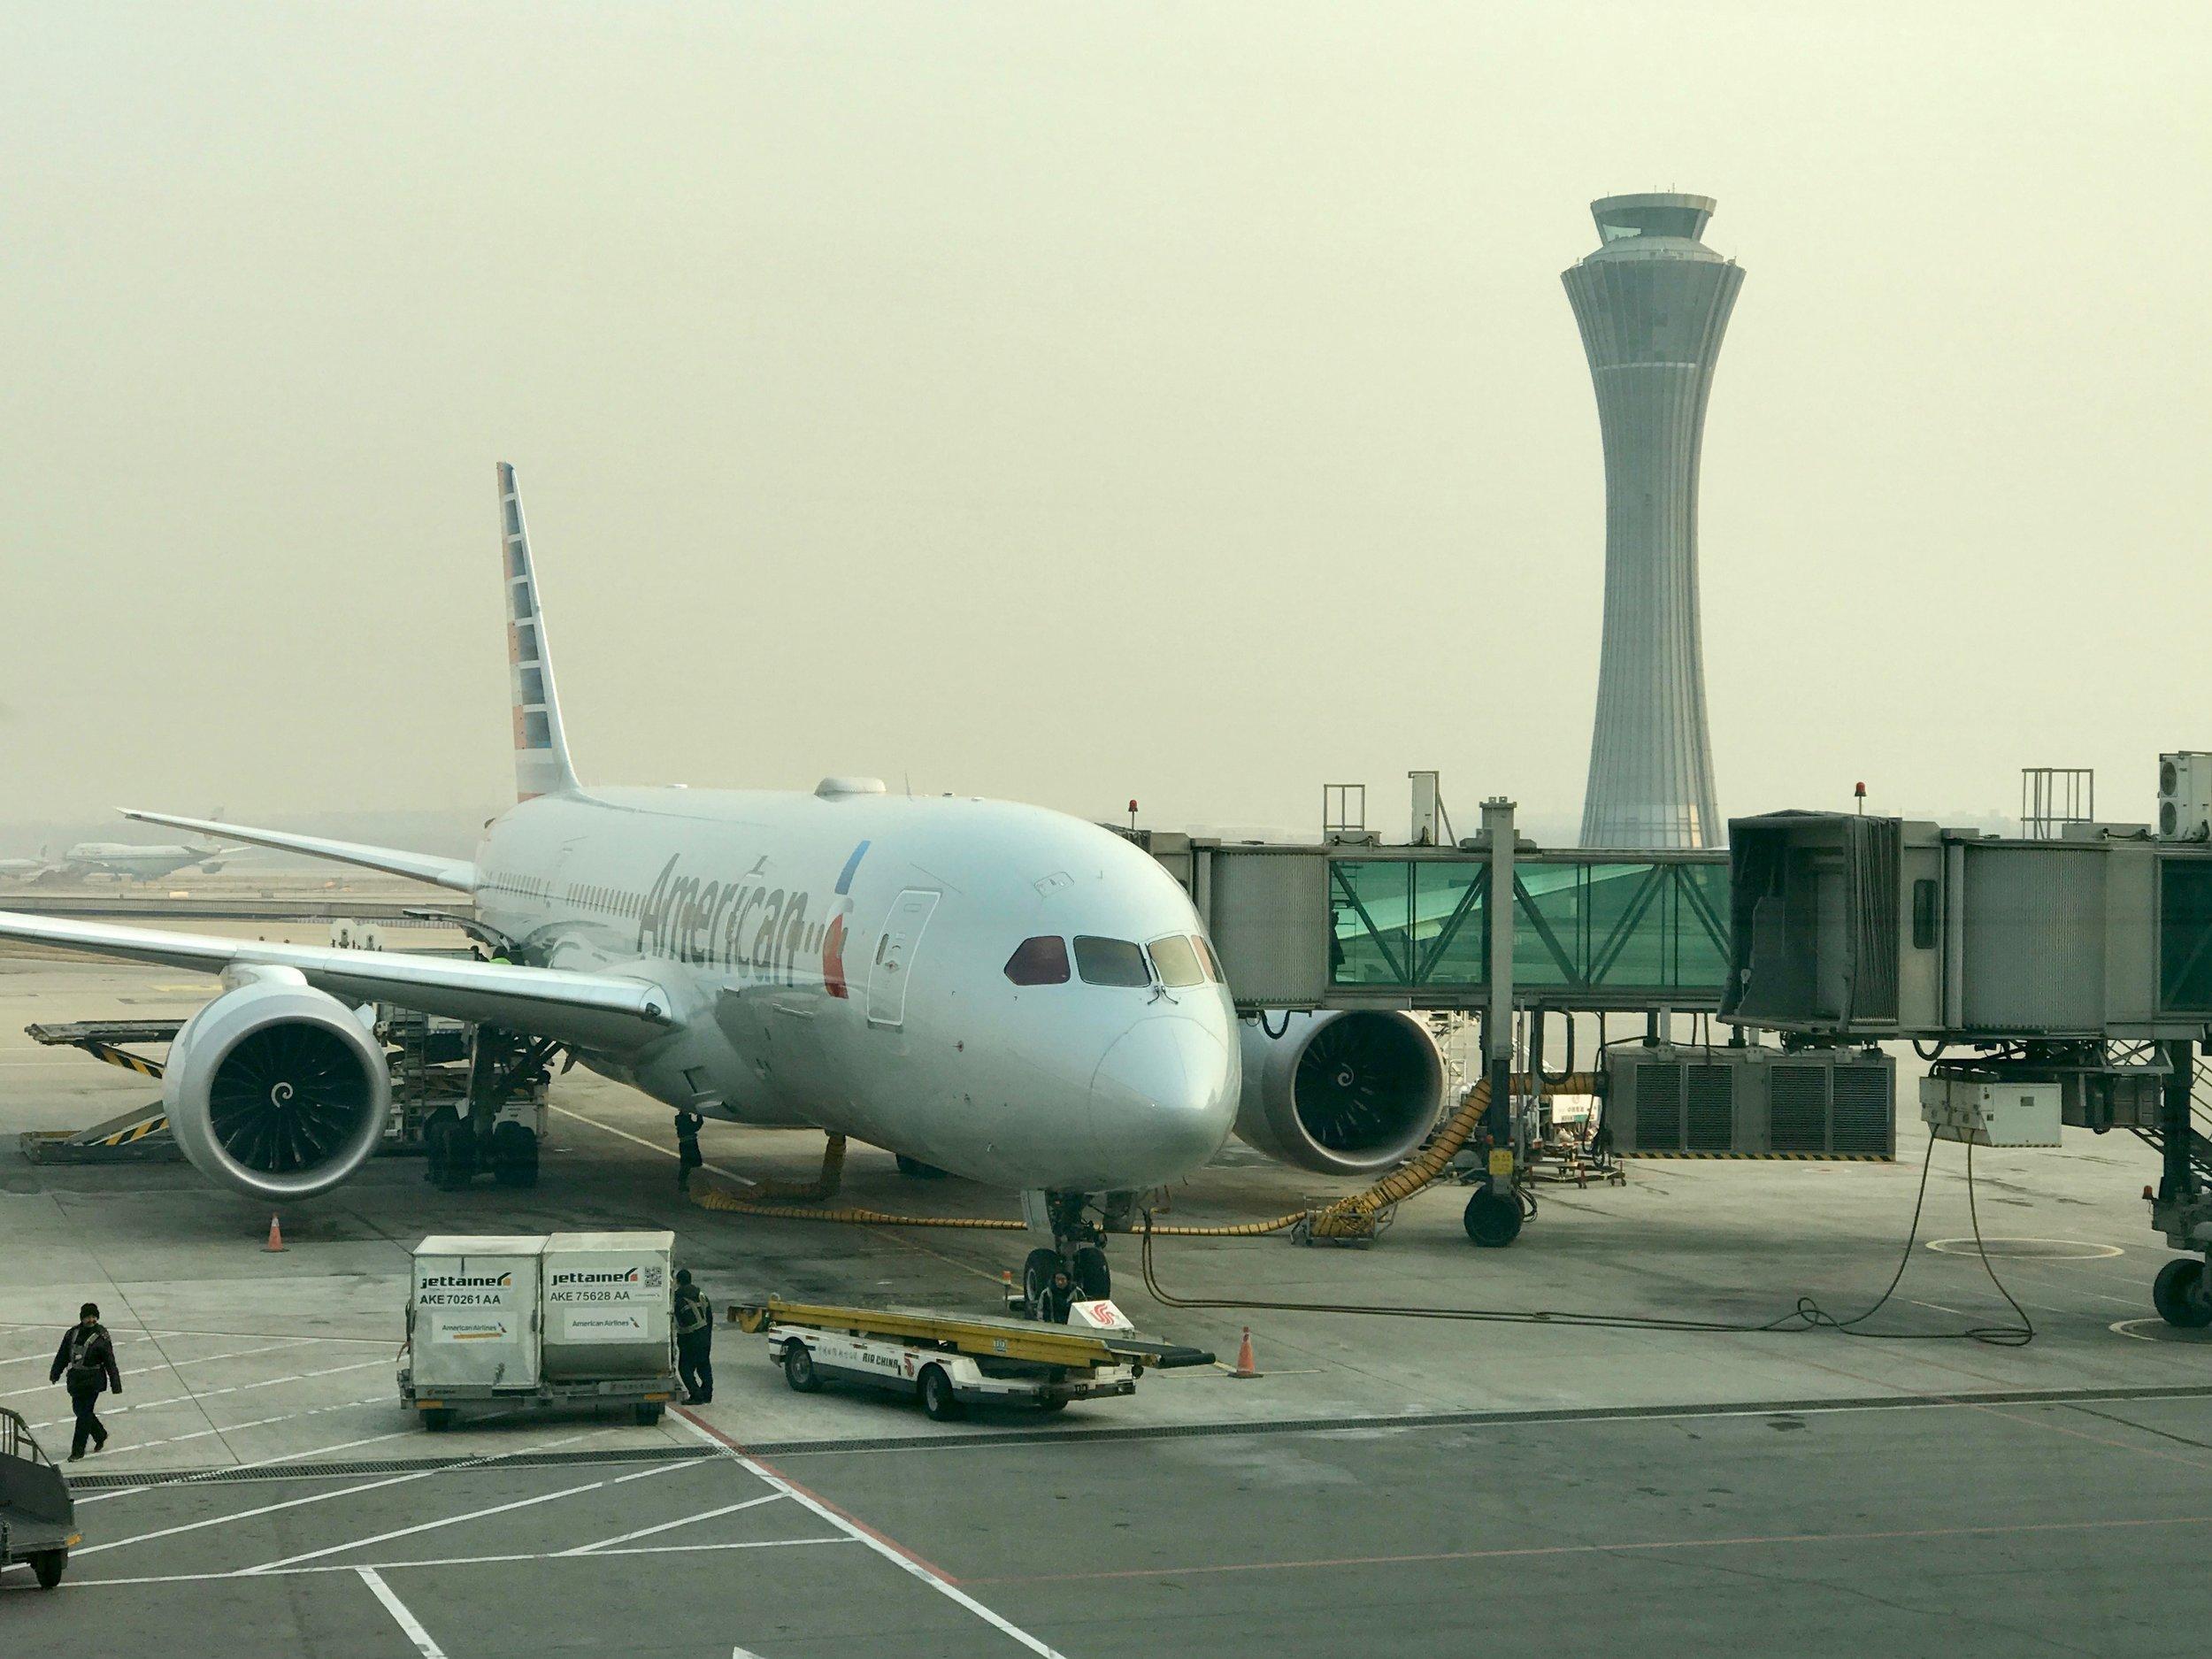 American Airlines 787 Dreamliner at Beijing Airport (PEK)